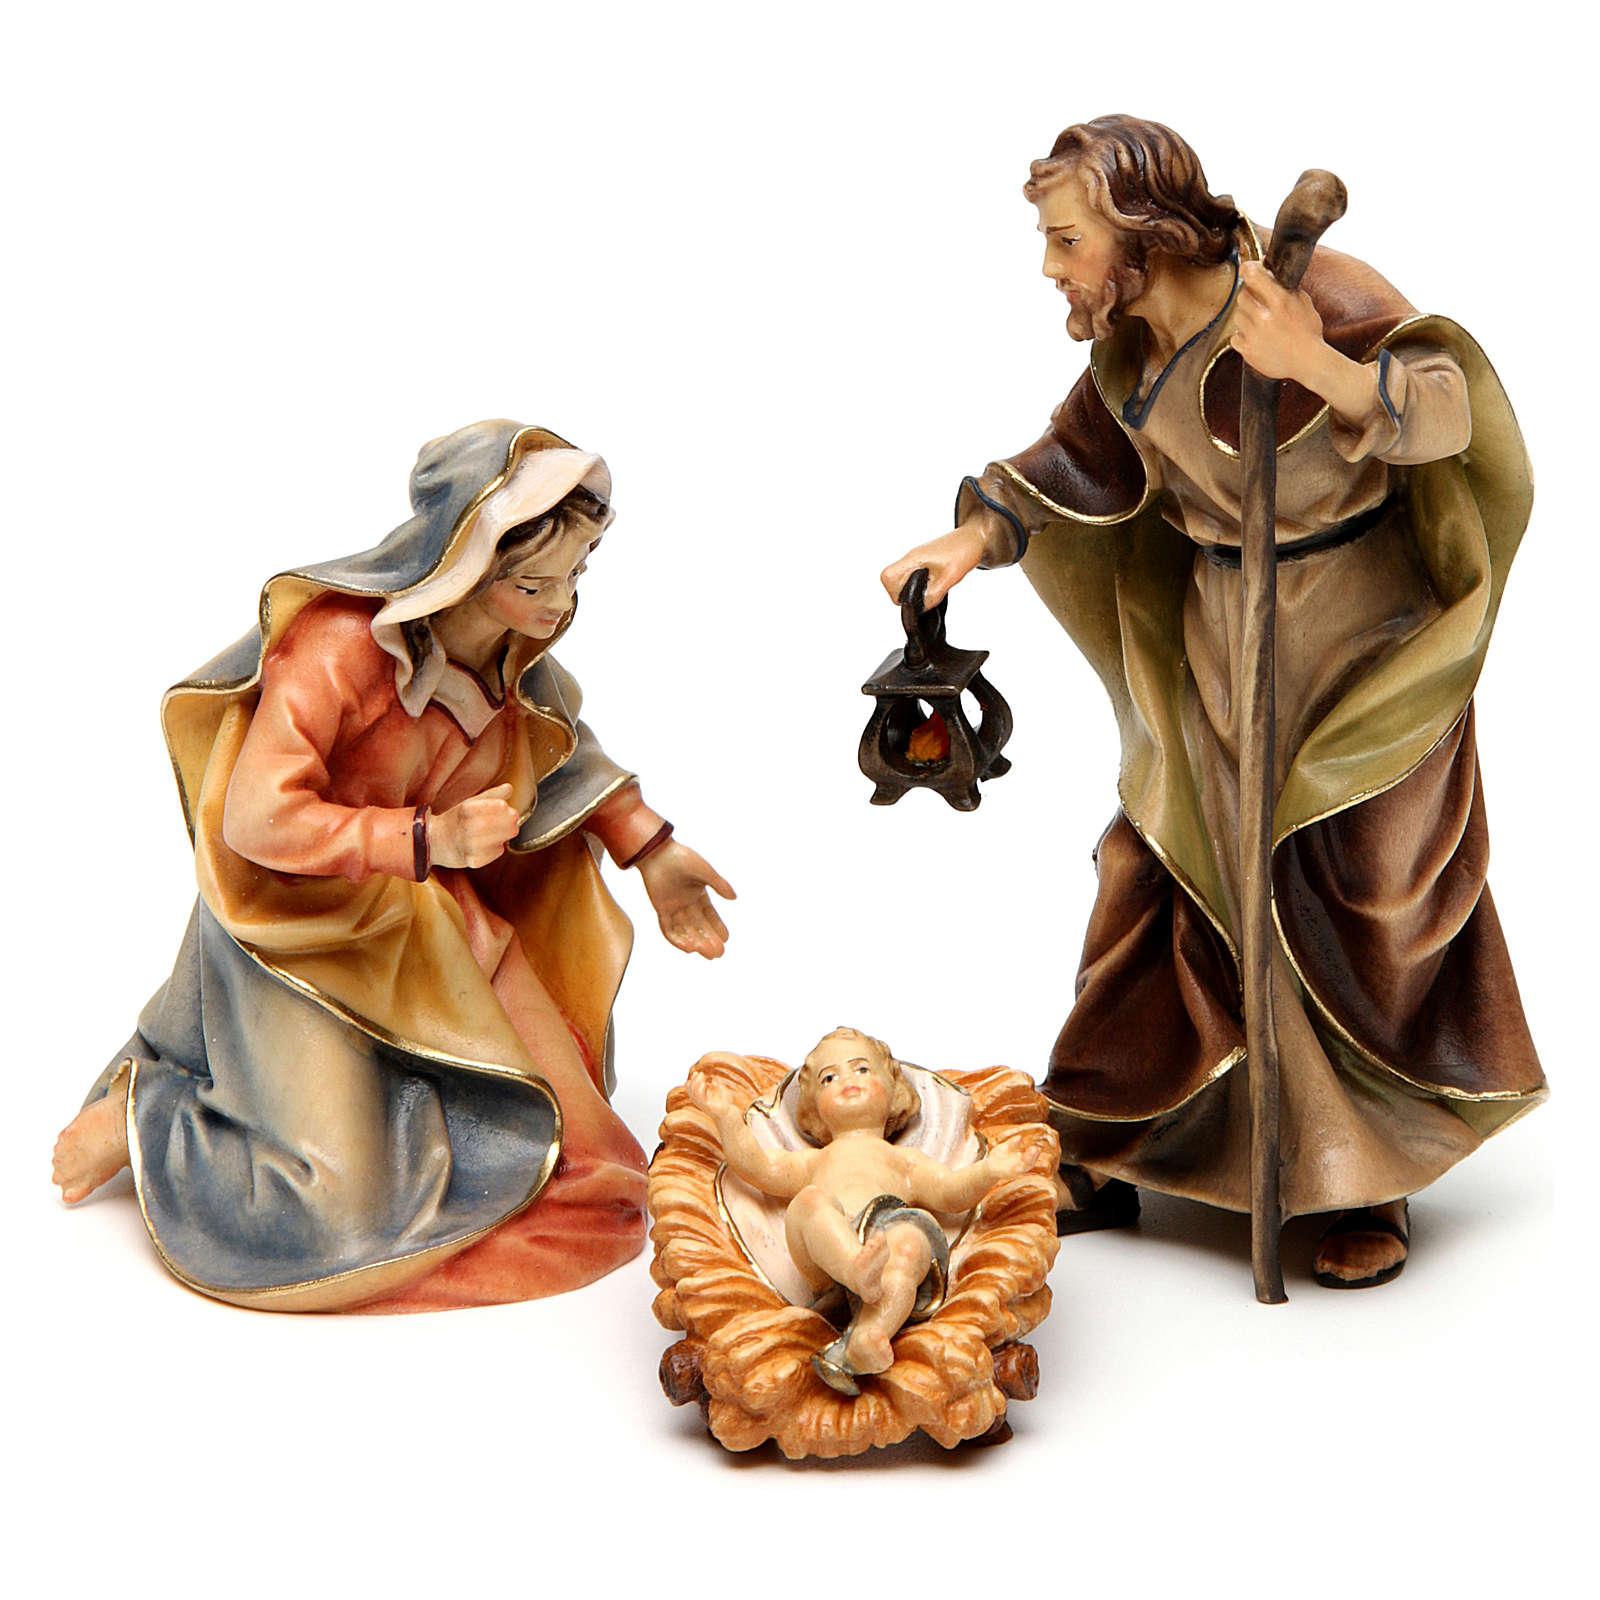 Natividad belén Original madera tres piezas pintada Val Gardena 12 cm de altura media 4